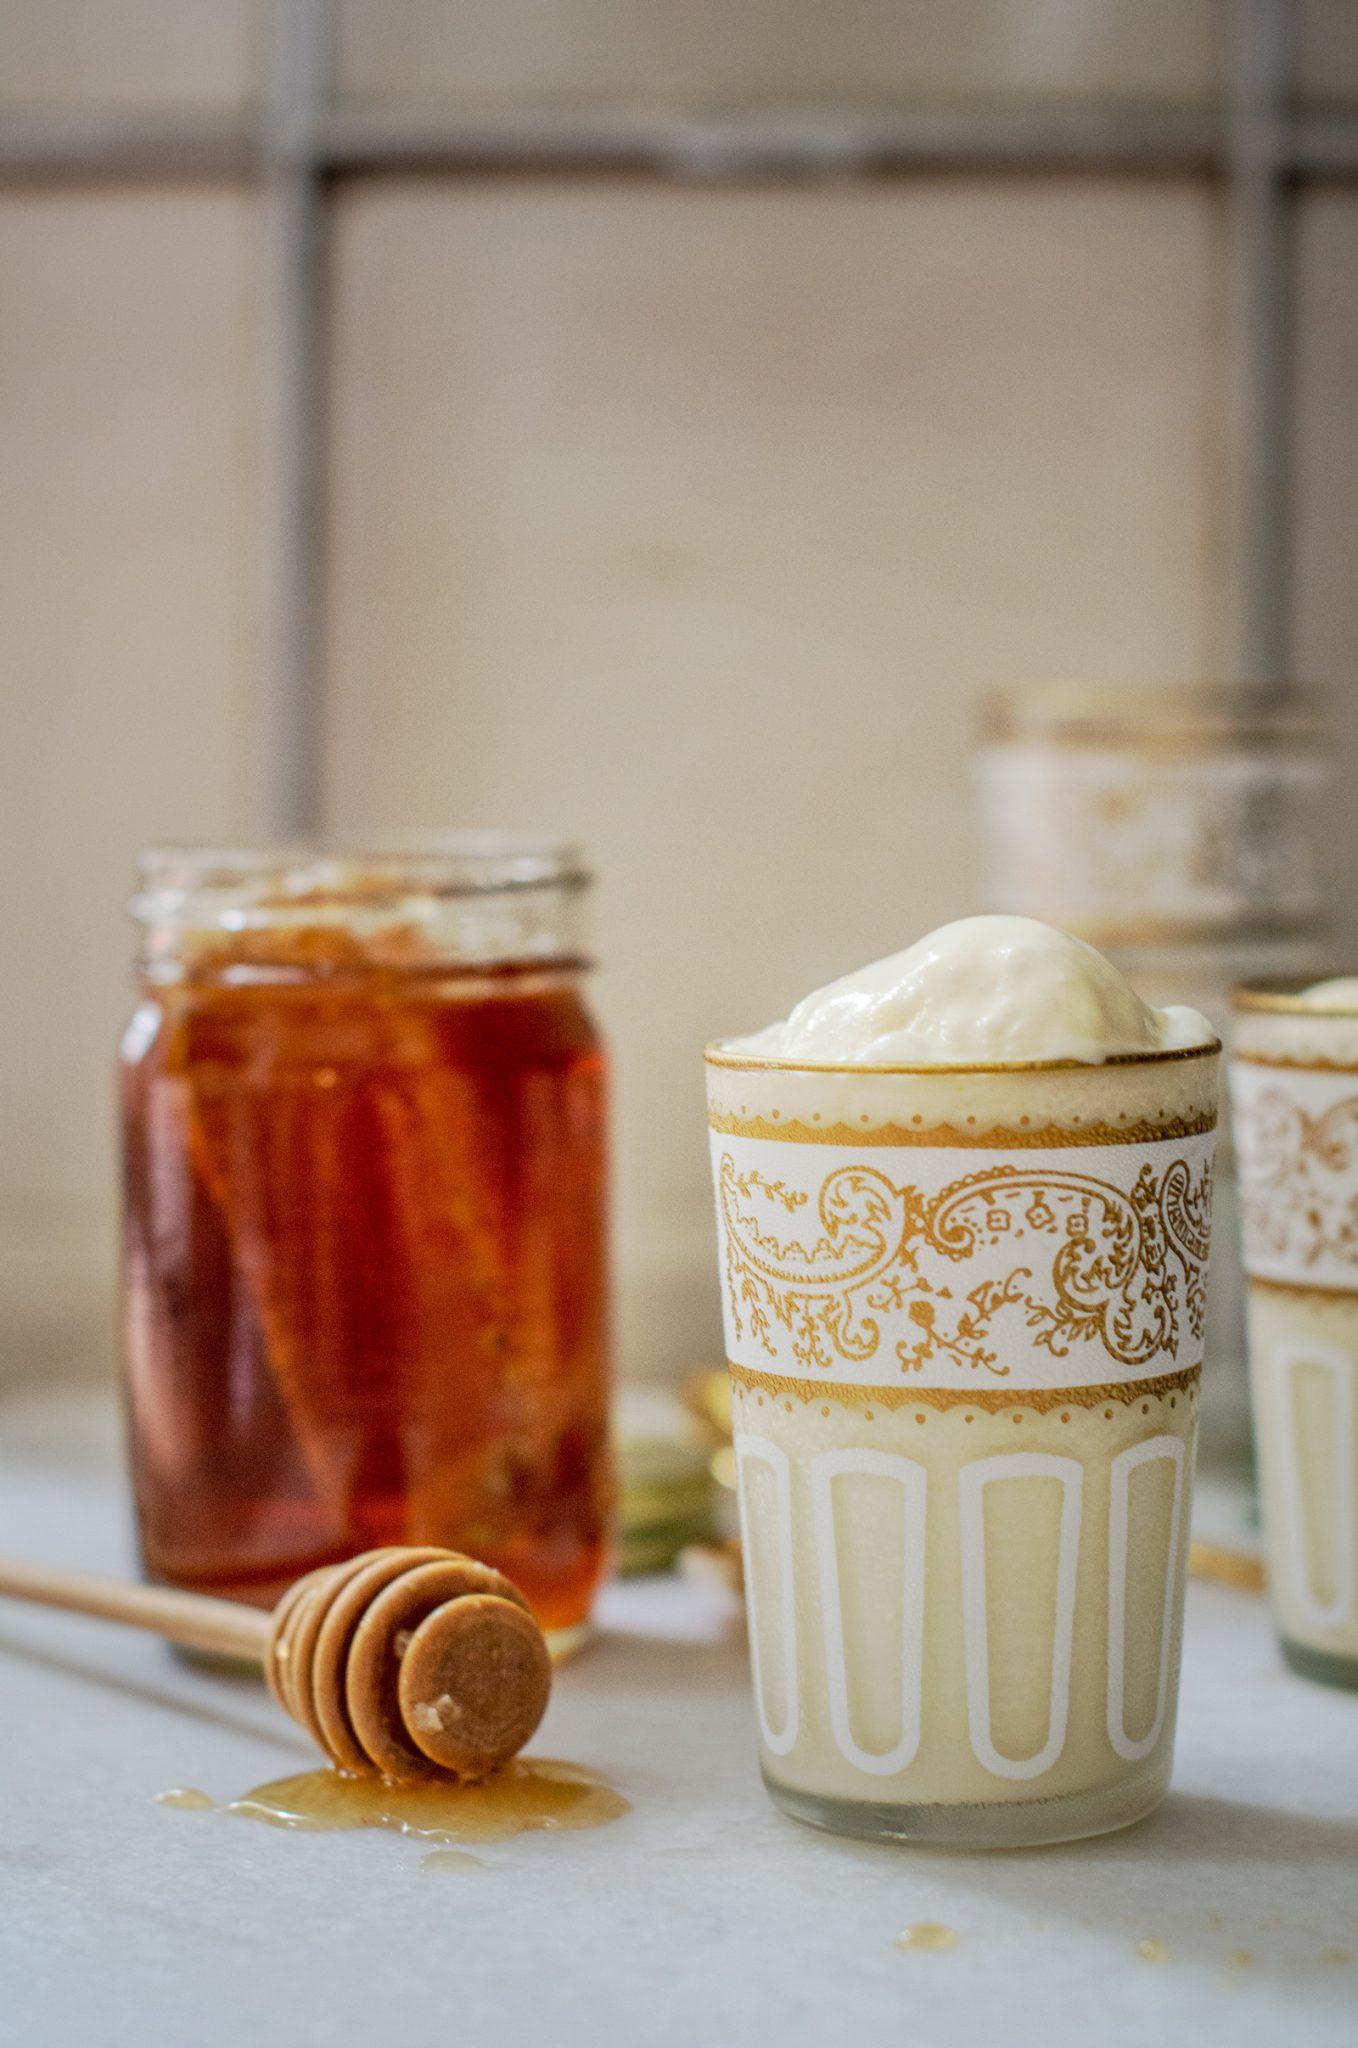 Rosemary and Honey Ice Cream Recipe